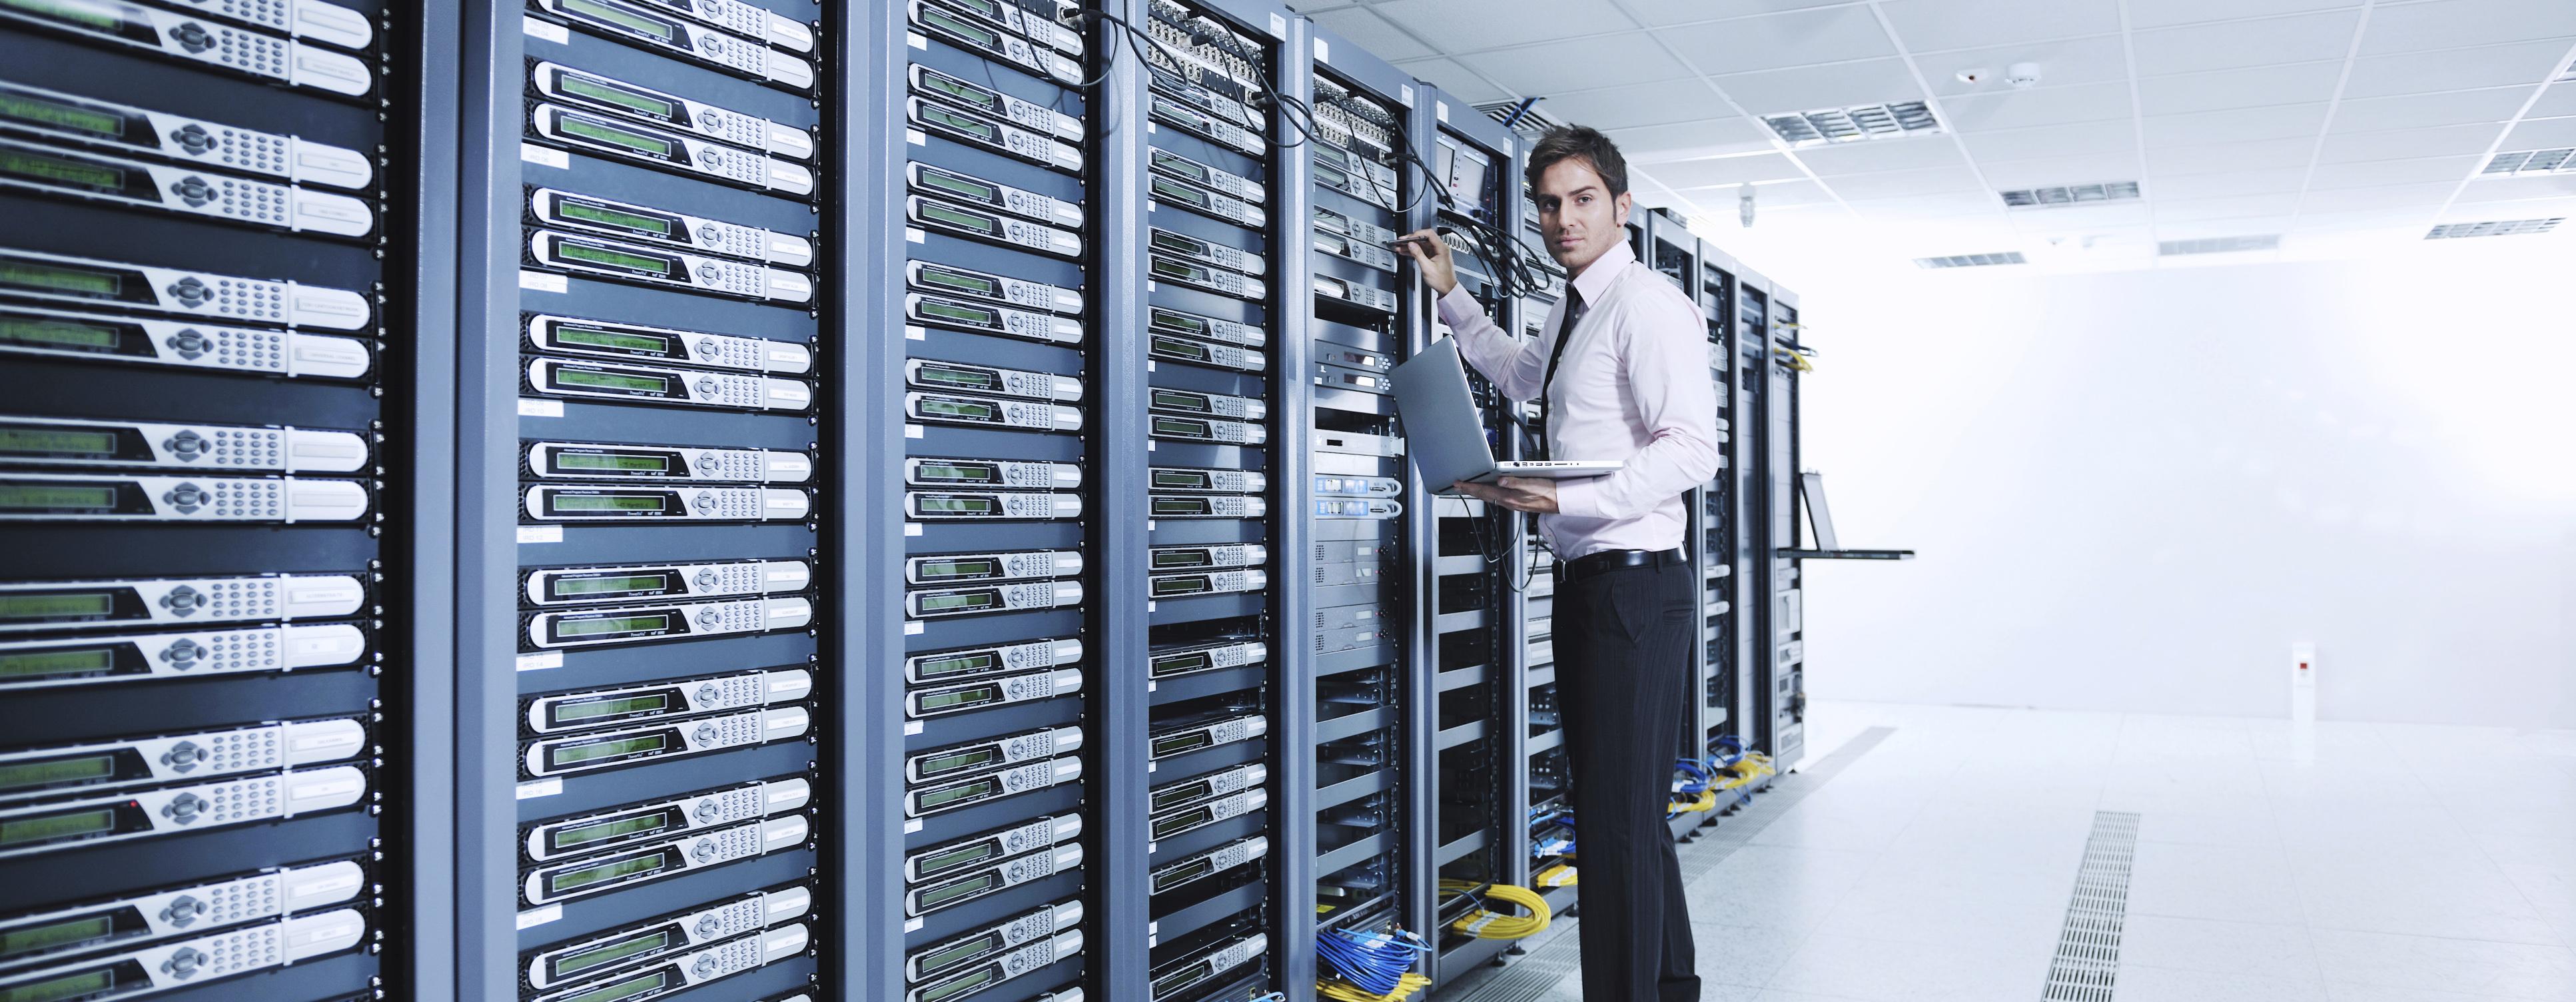 FREE SQL Server 2016 Hosting – DiscountService.biz